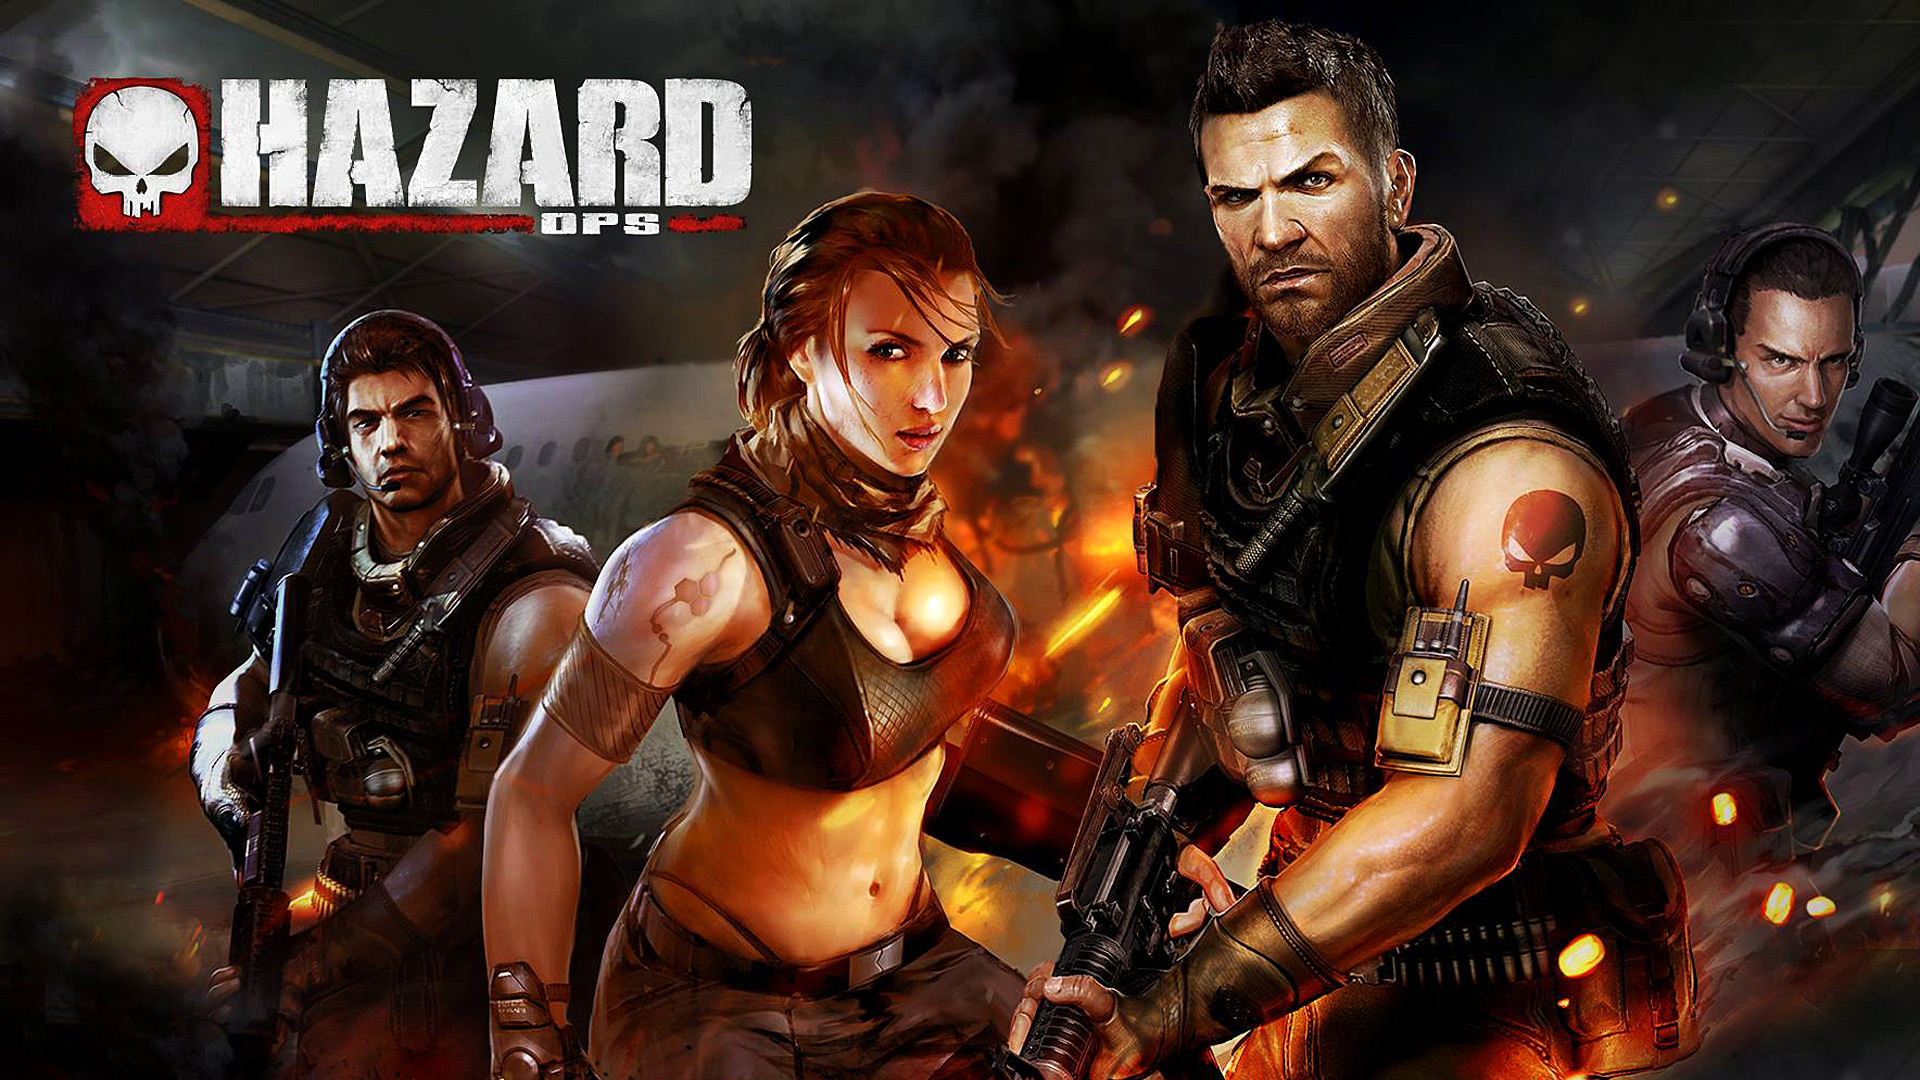 Hazard Ops - Neuer Action Shooter